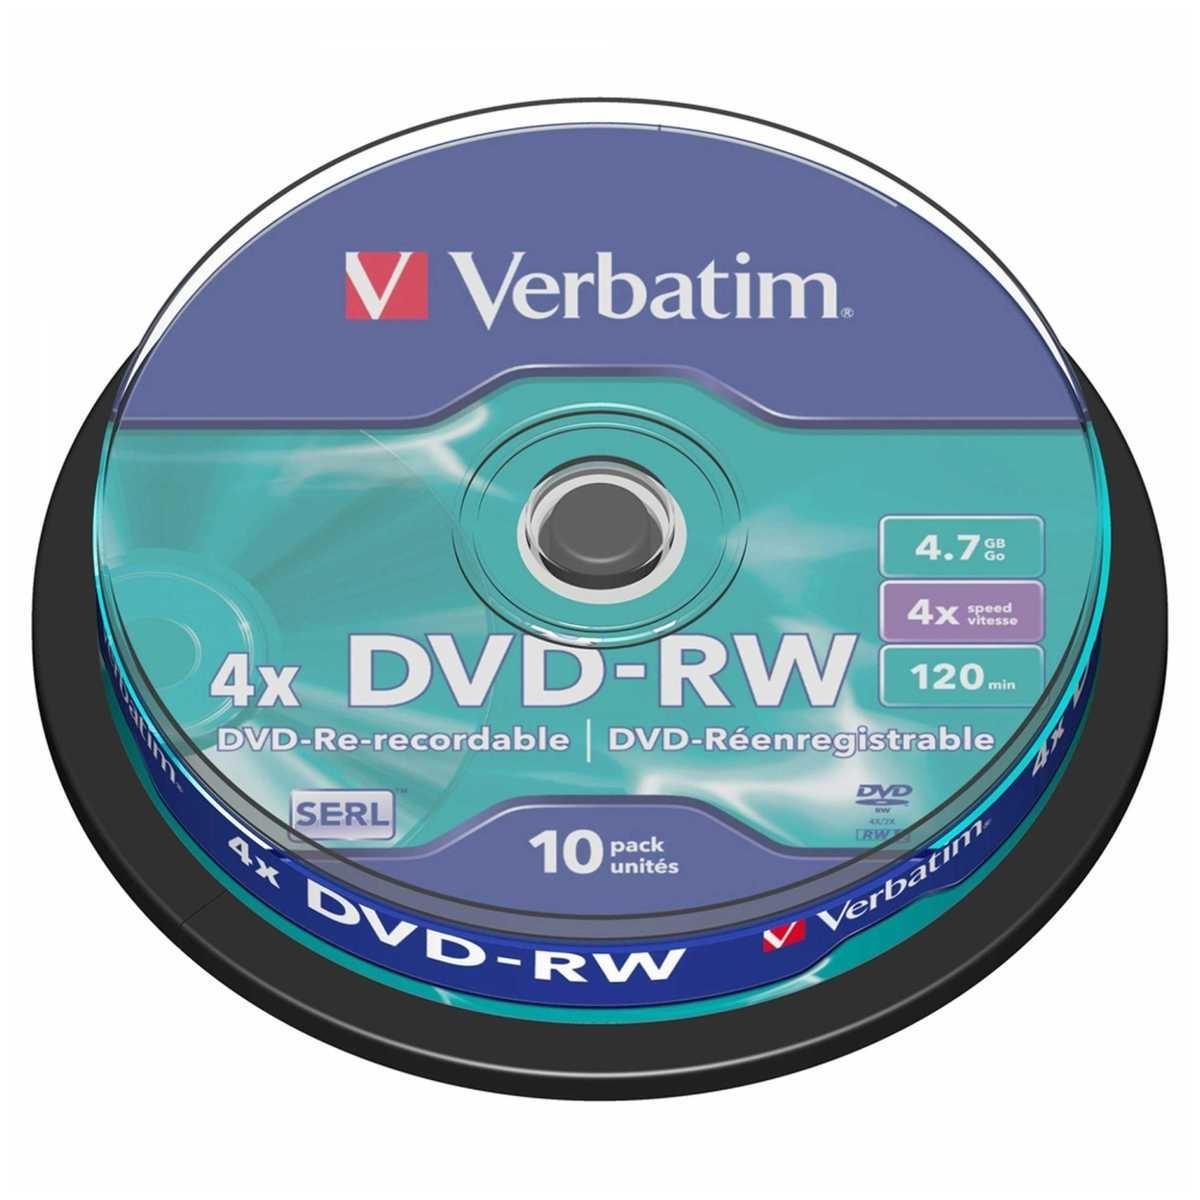 Диск DVD-RW Verbatim 4.7Gb 4x Cake Box (10 шт) - Расходные материалы